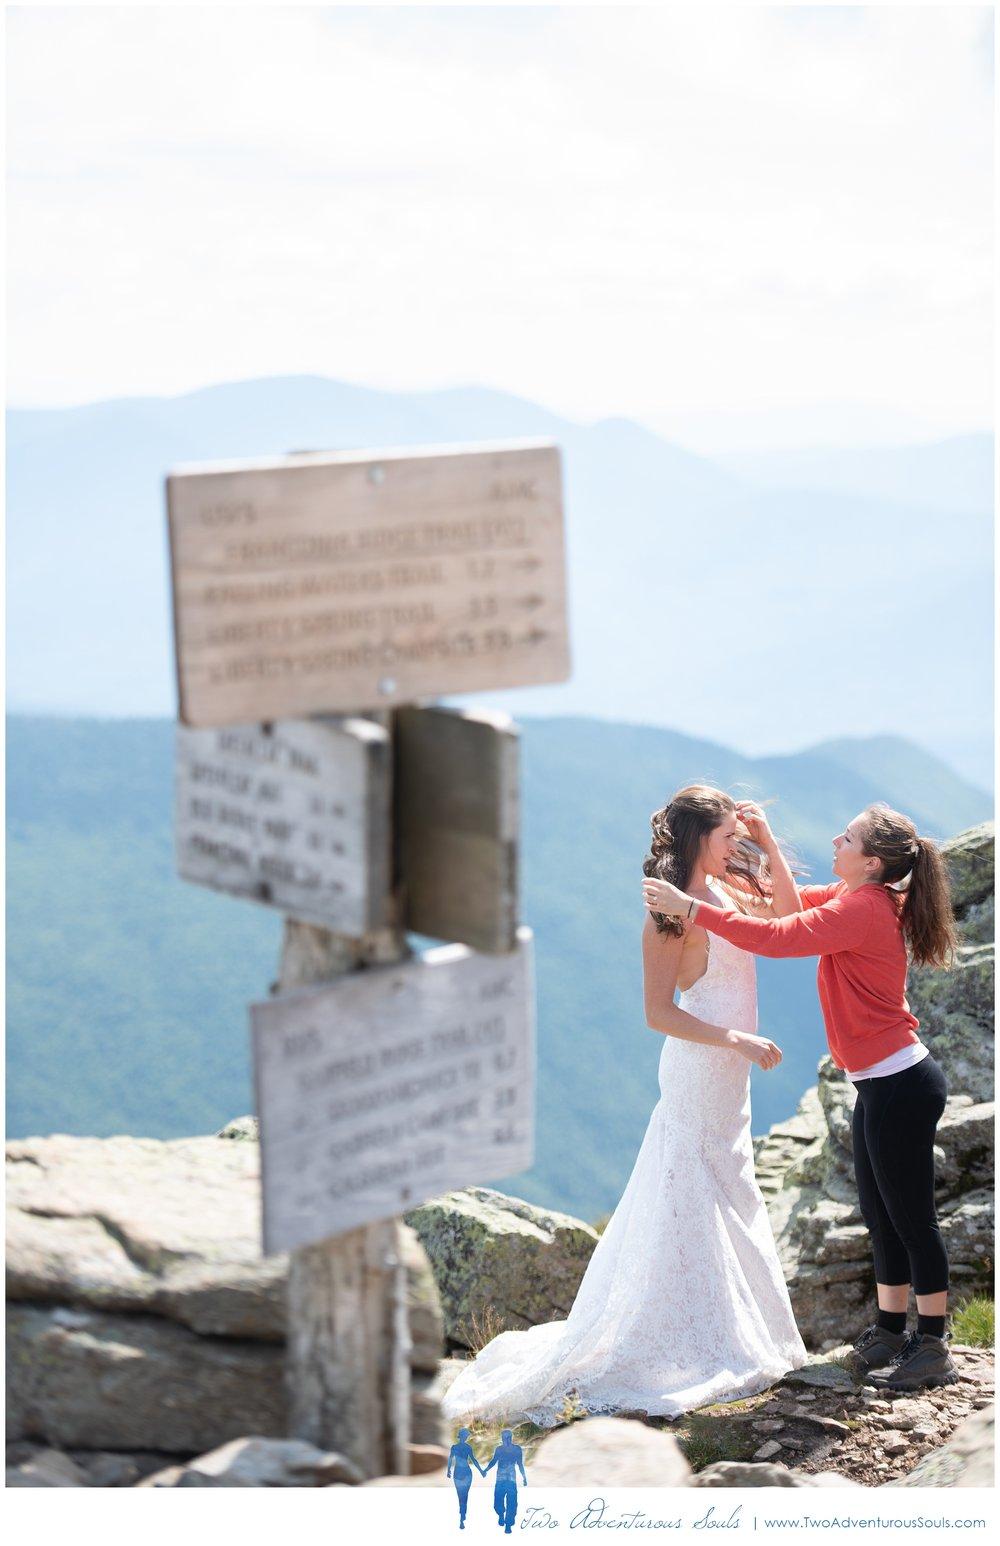 081818 - Chana & Rich - wedding SNEAKS-110_Adventure Wedding, Destination Wedding Photographers.jpg